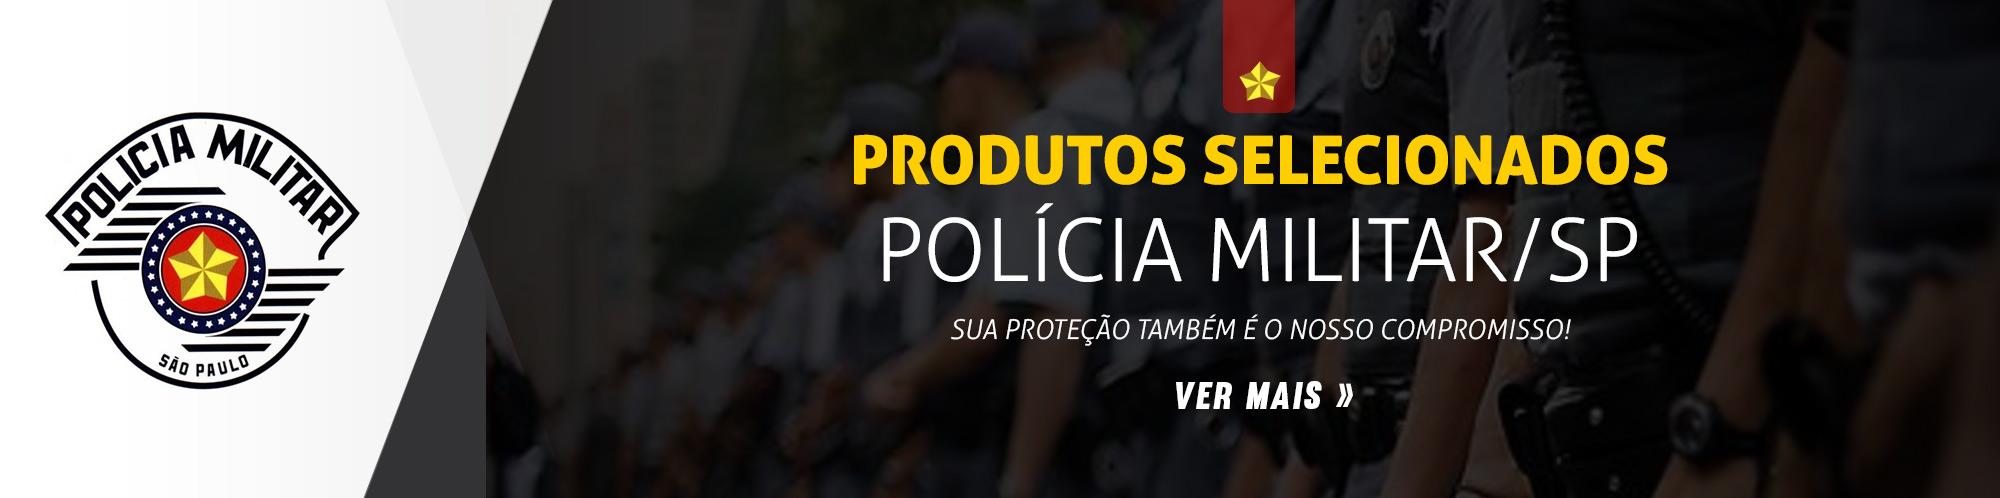 Banner Polícia Militar